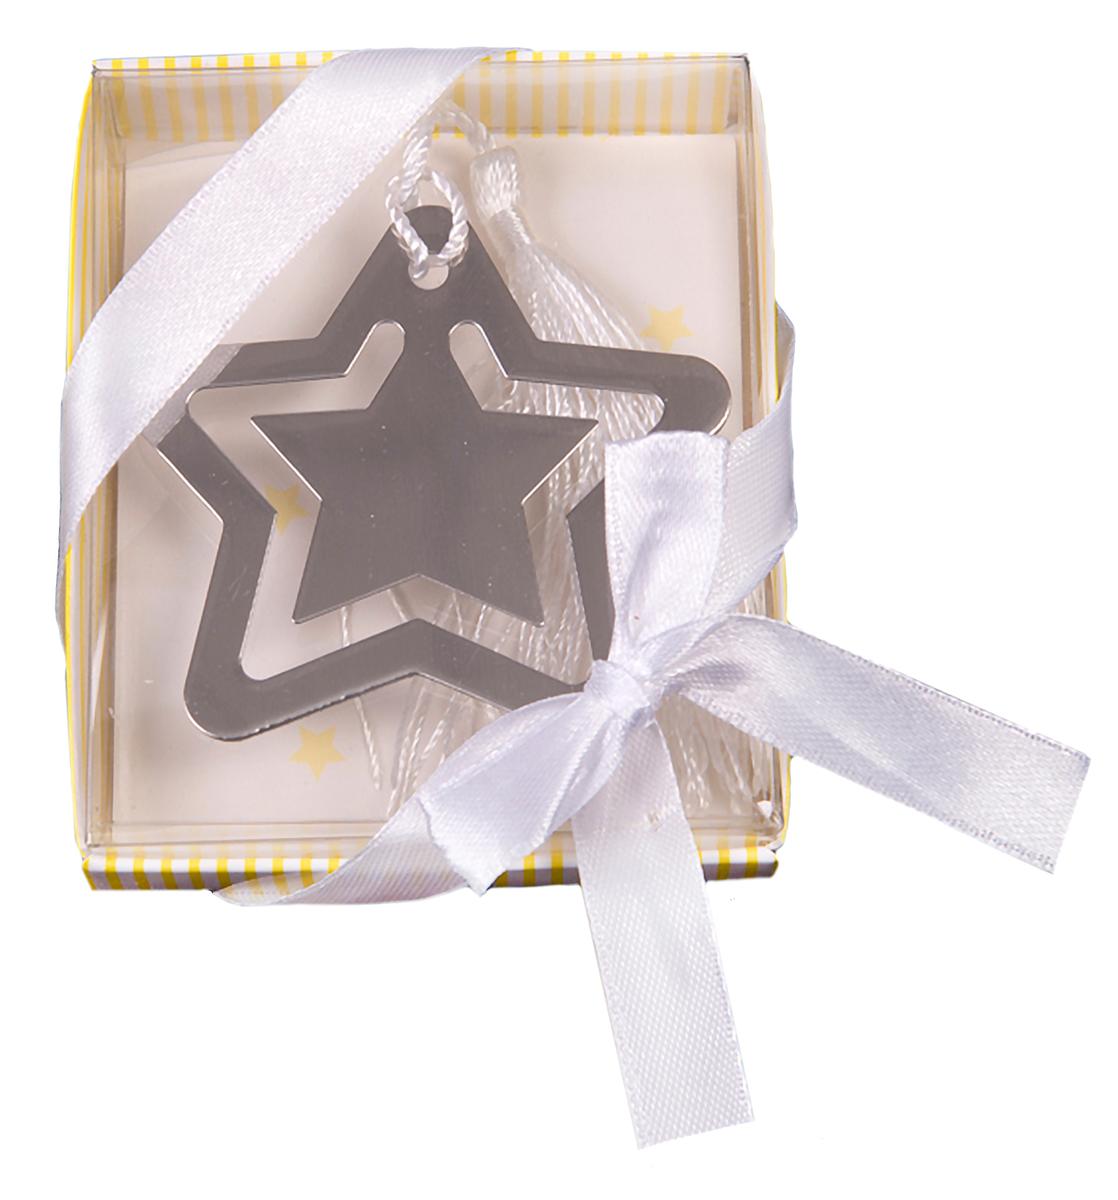 Magic Home Закладка для книг Звезда